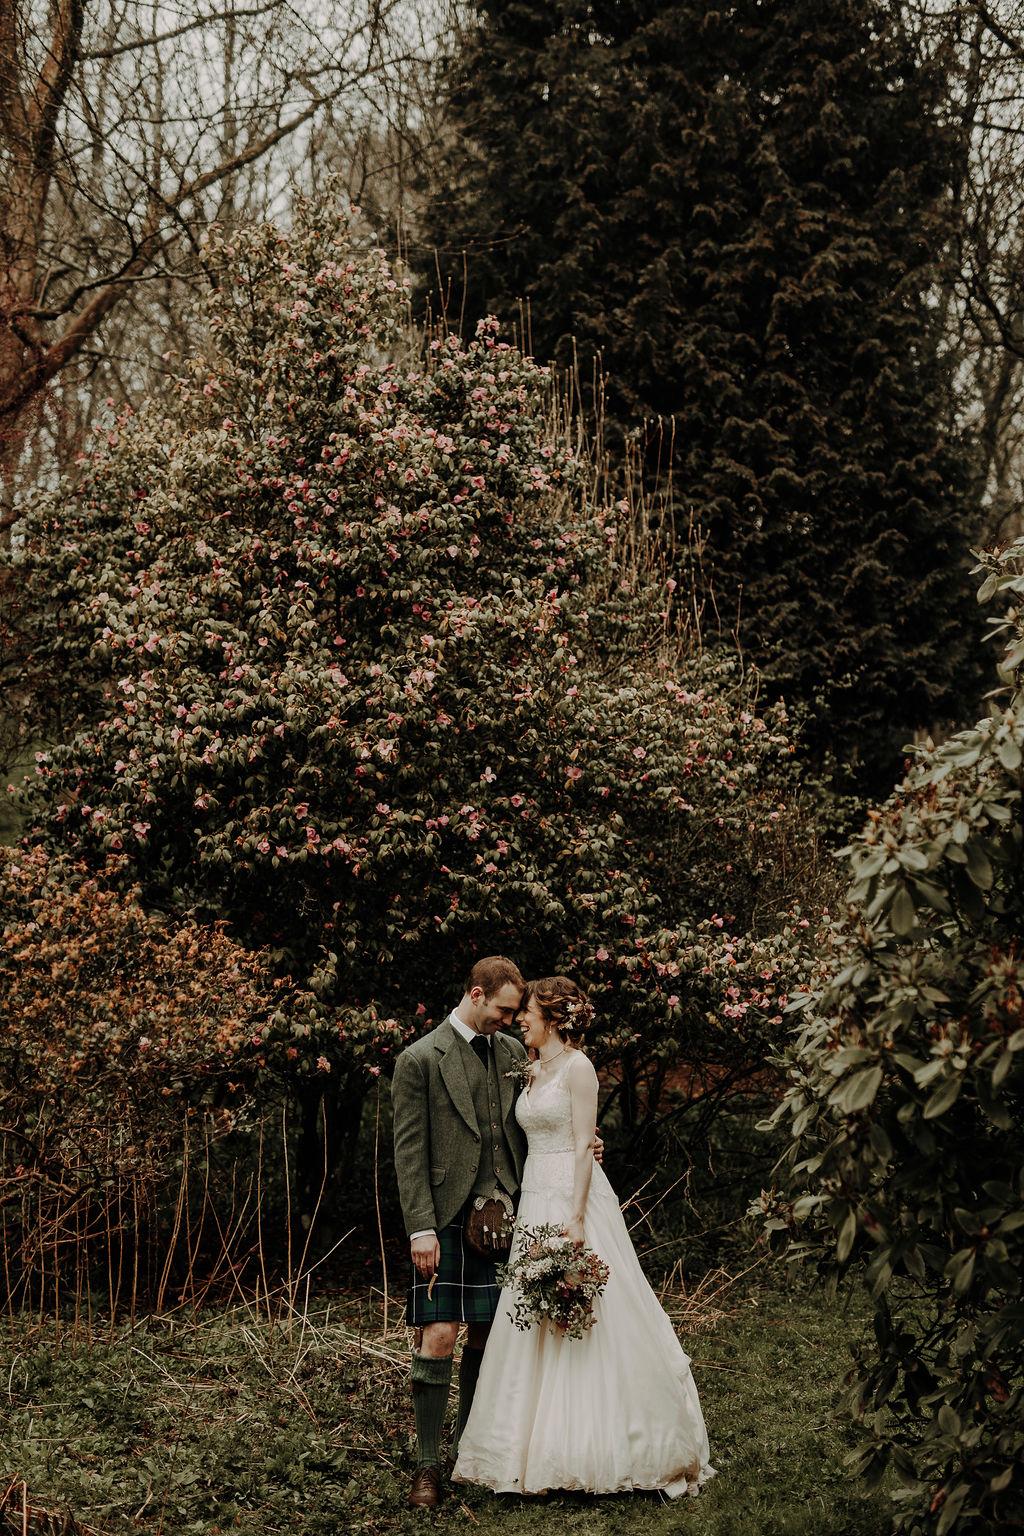 Inchyra wedding photographer